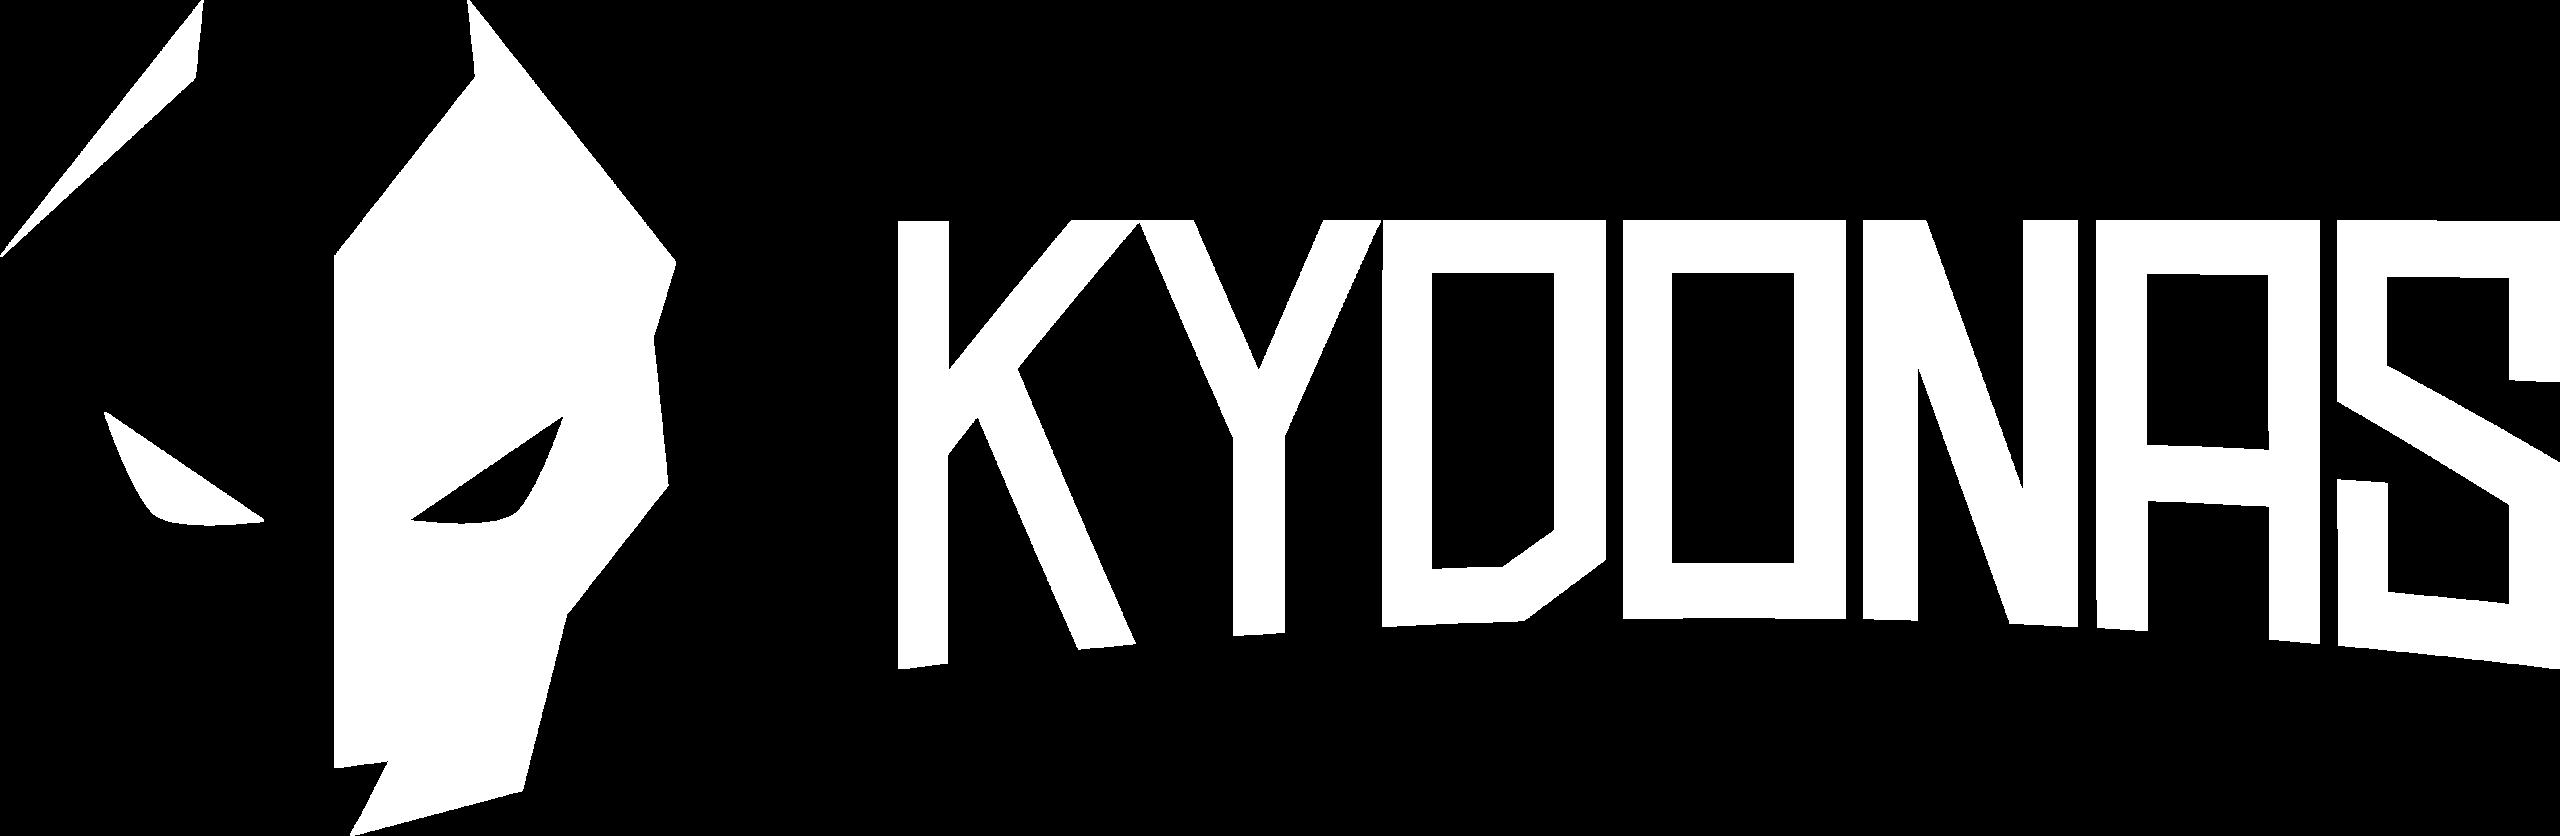 Kydonas Sports Logo